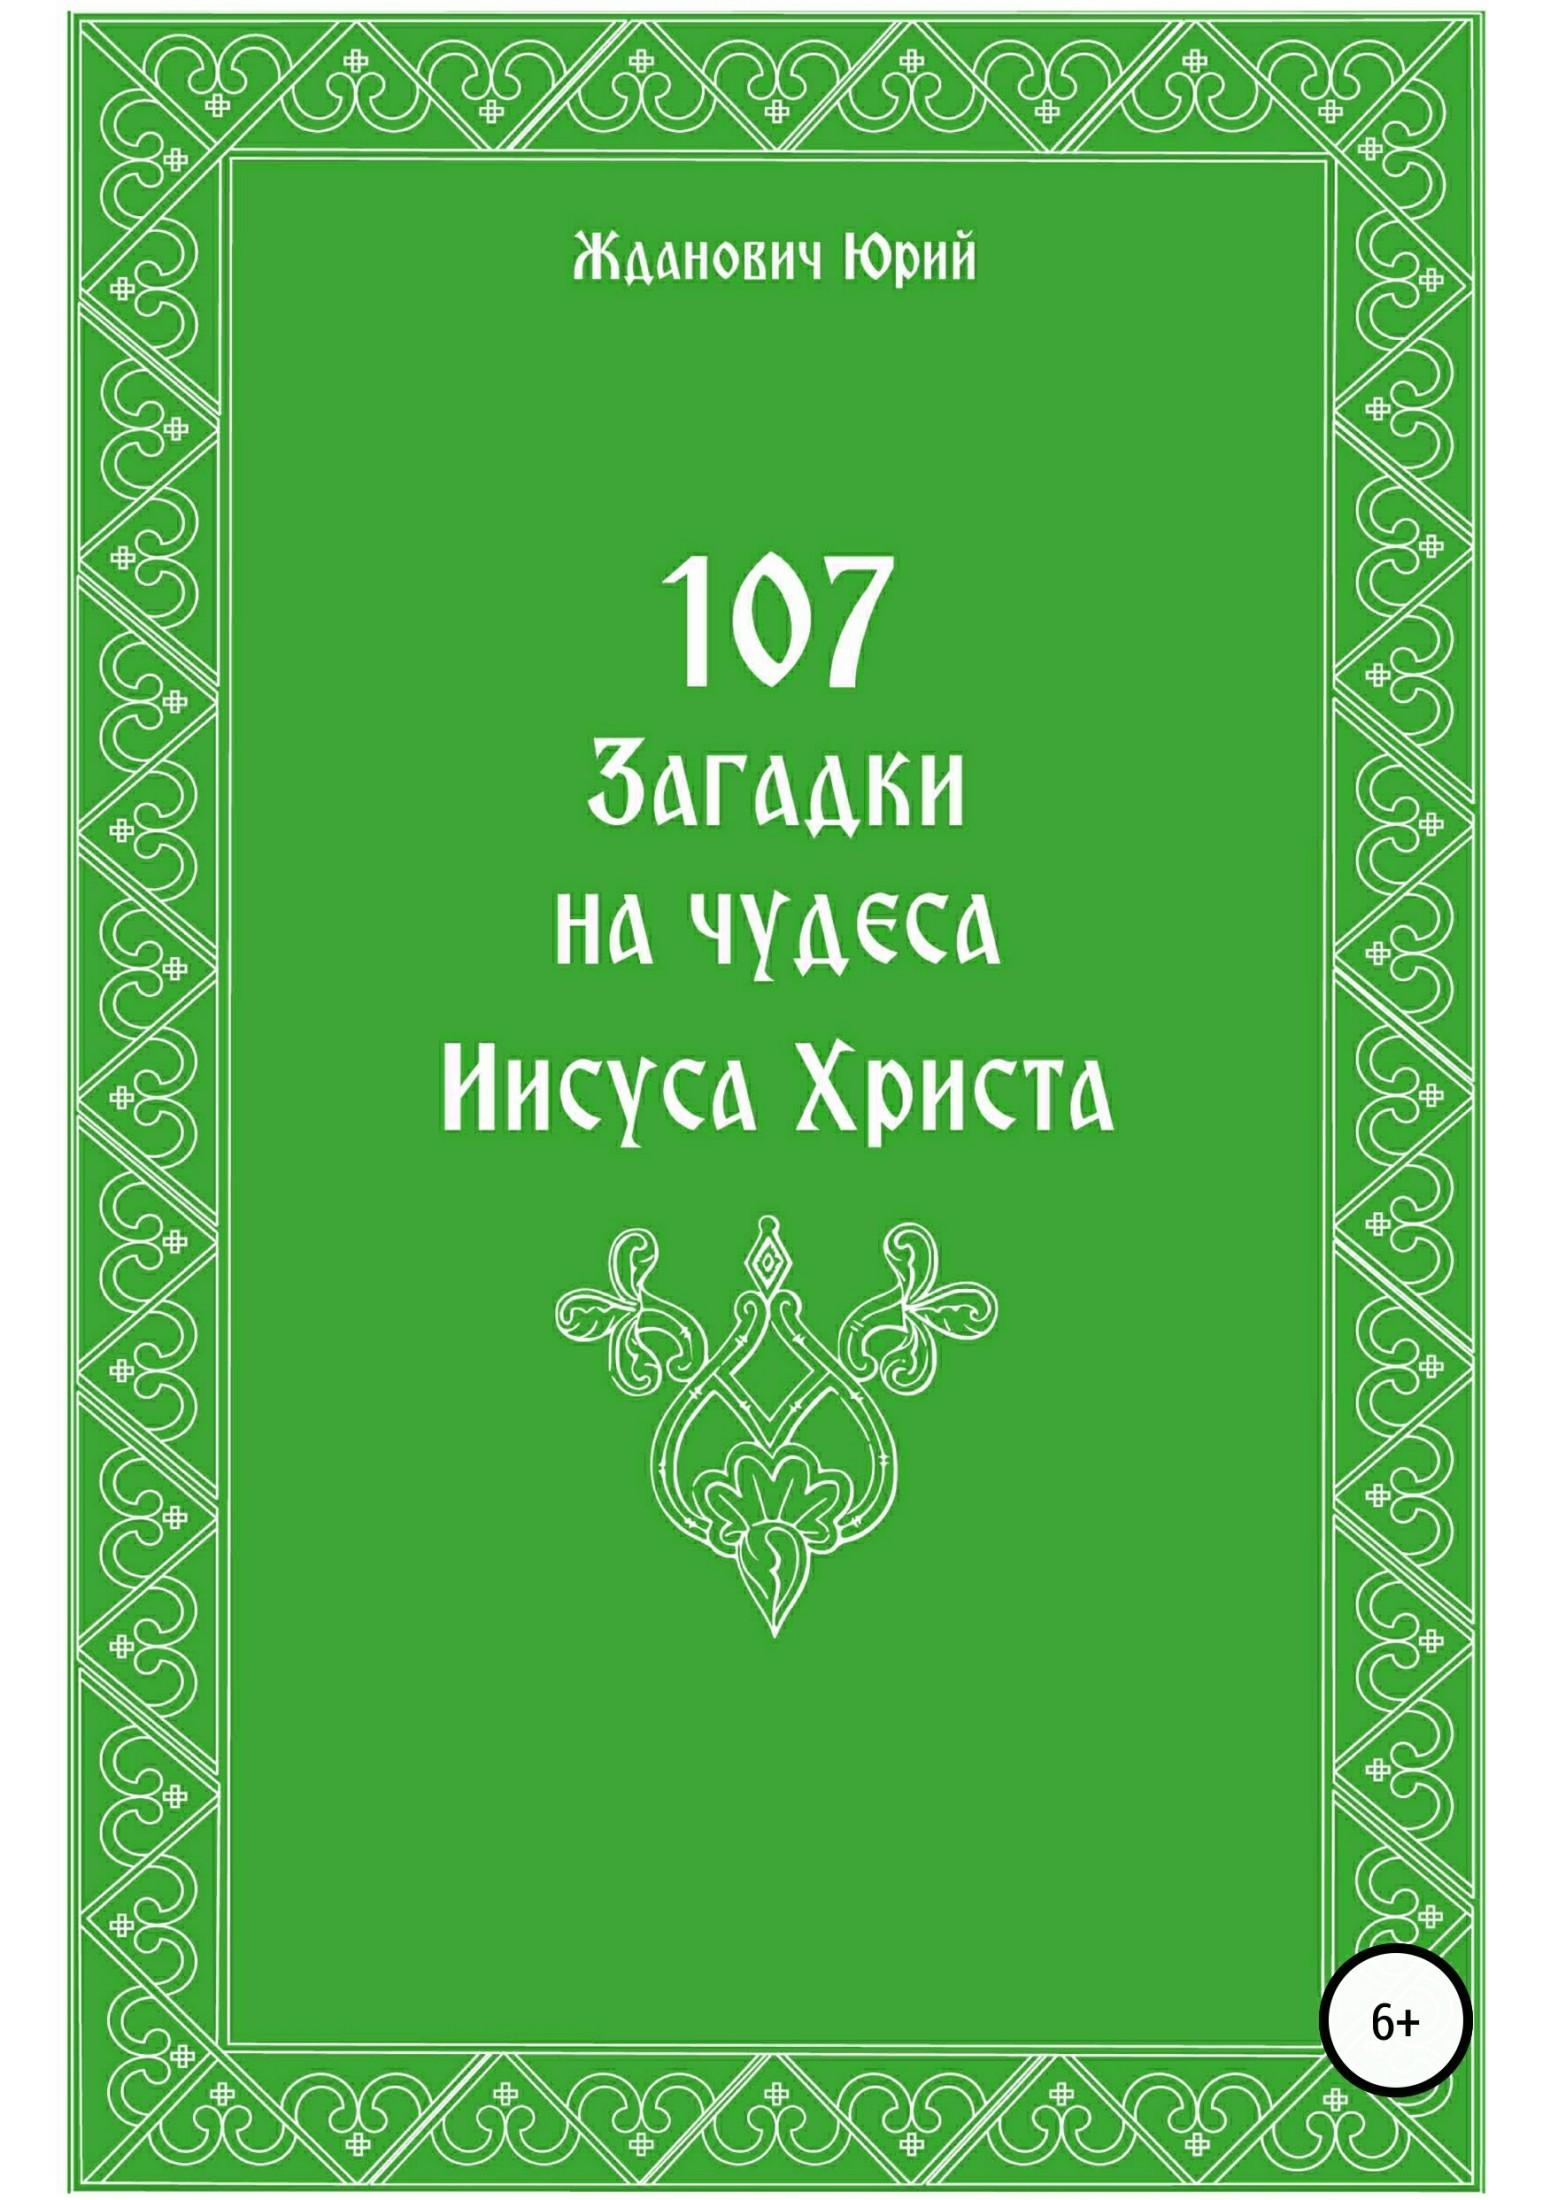 Юрий Михайлович Жданович 107 загадок на чудеса Иисуса Христа чудеса и куралесы